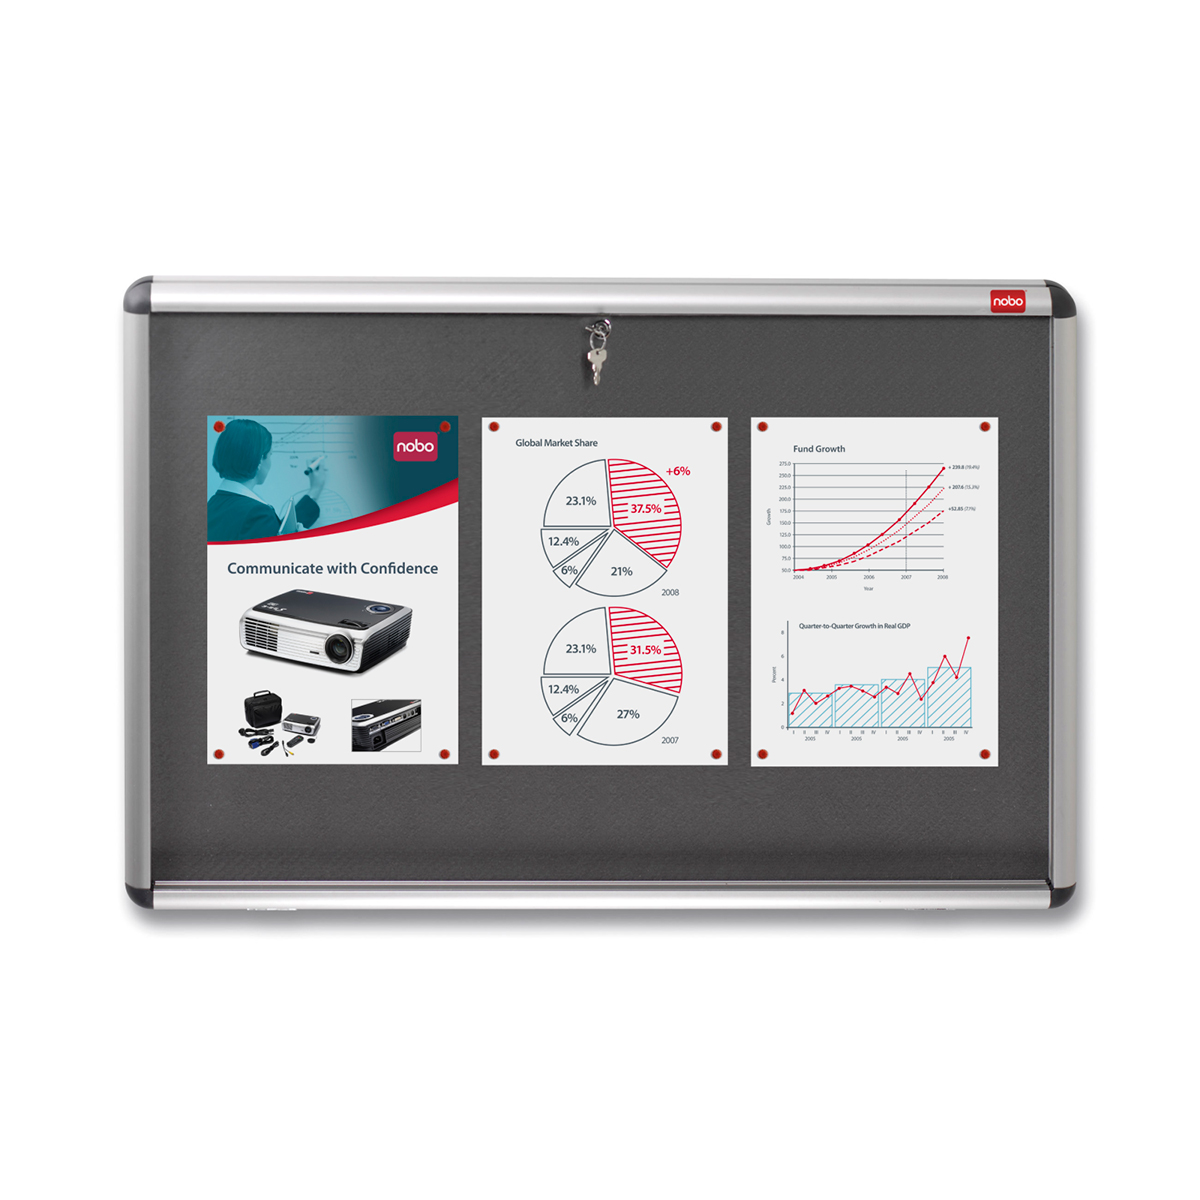 Nobo 31333501 A0 Internal Display Case with Grey Felt